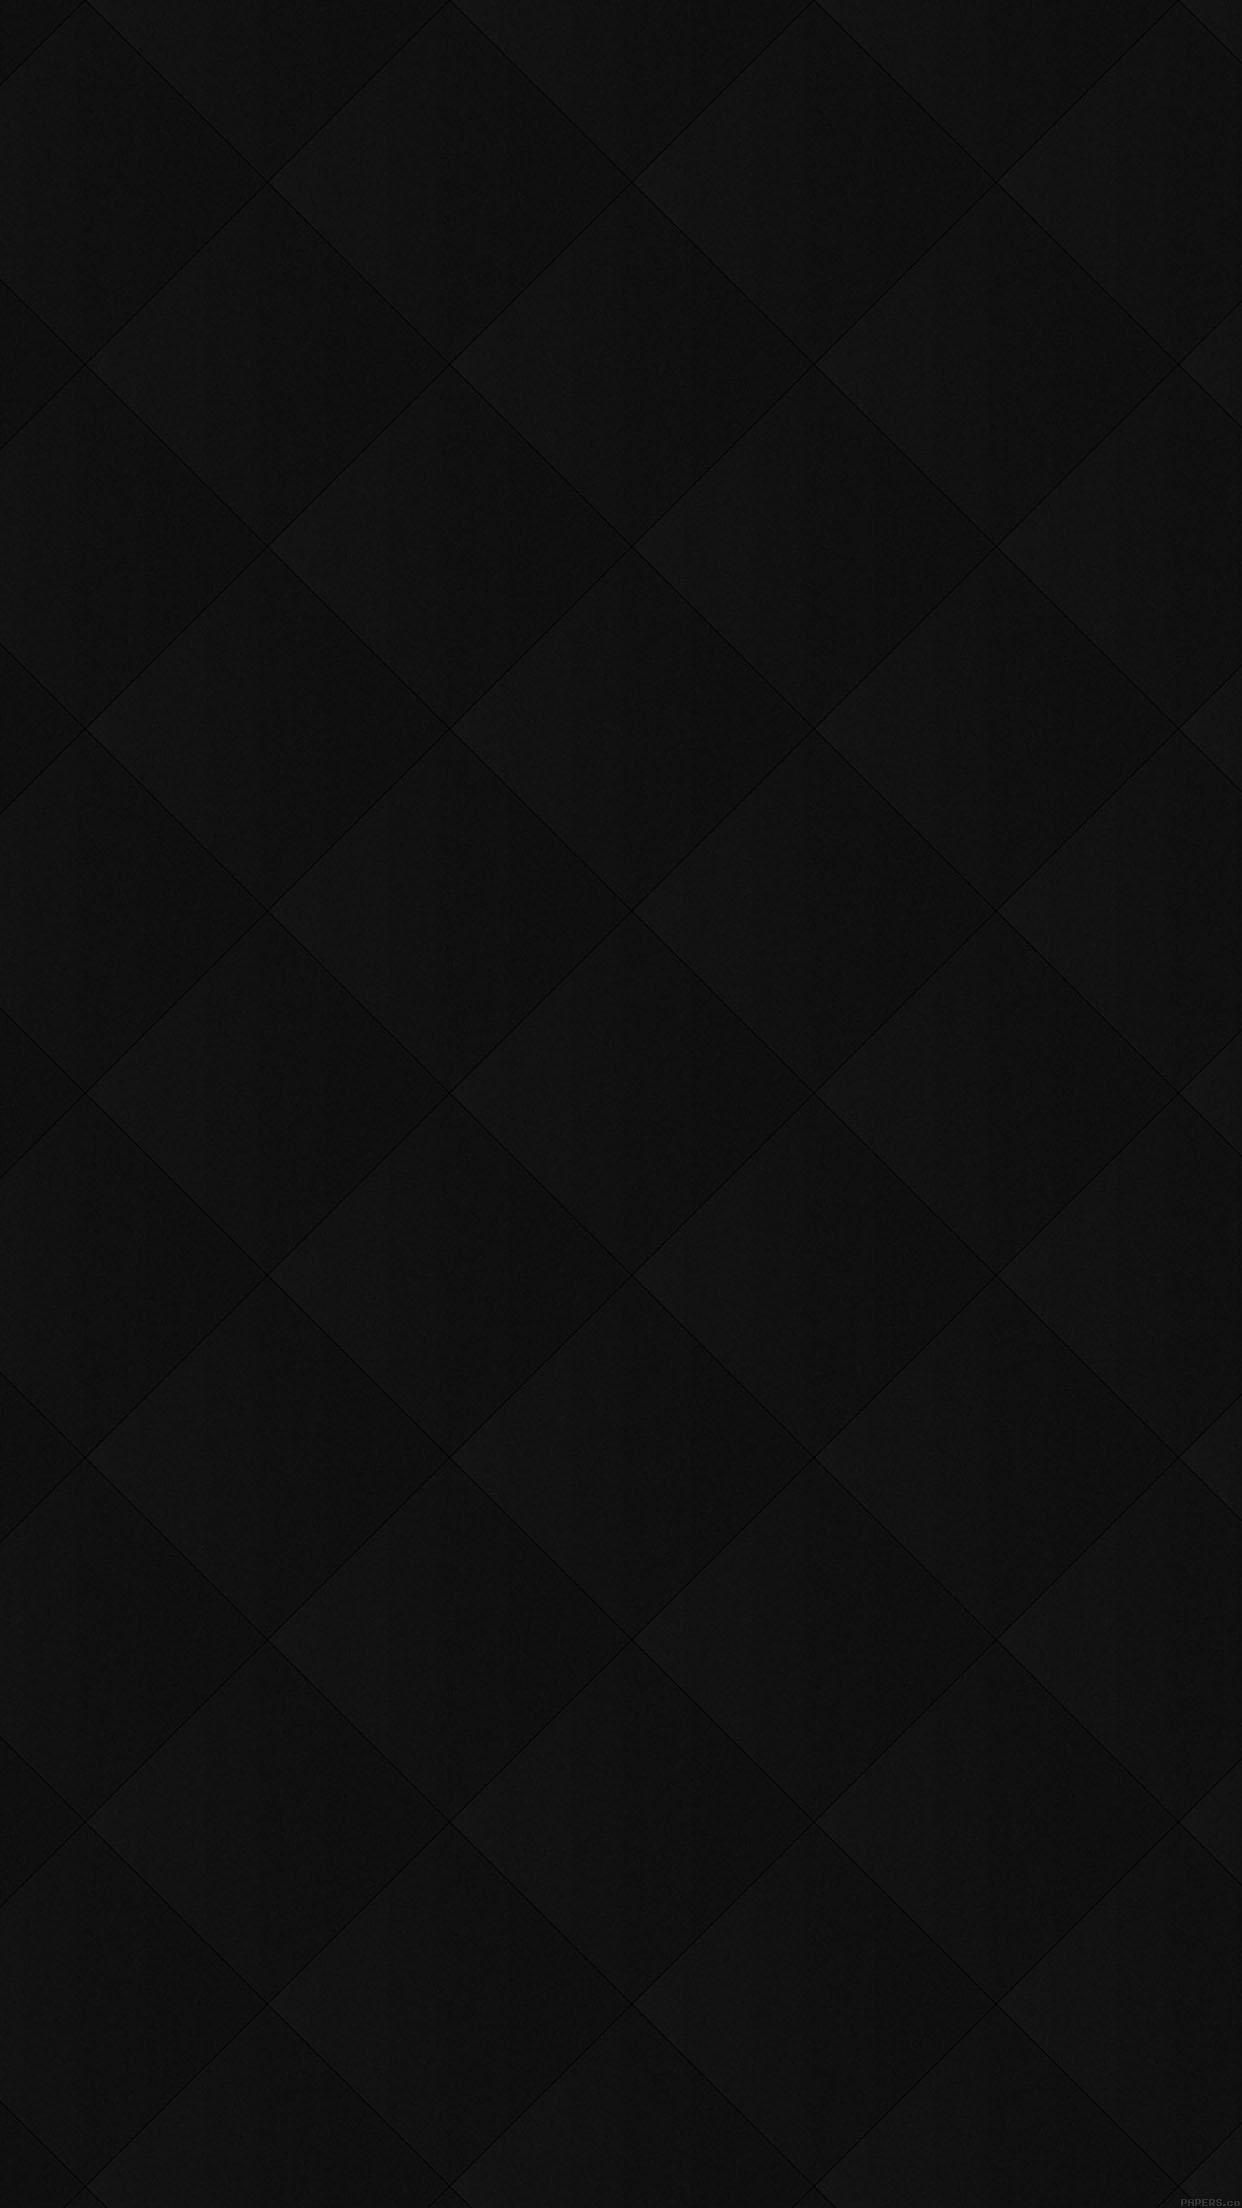 Vb09 Wallpaper Gradient Squares Dark Pattern